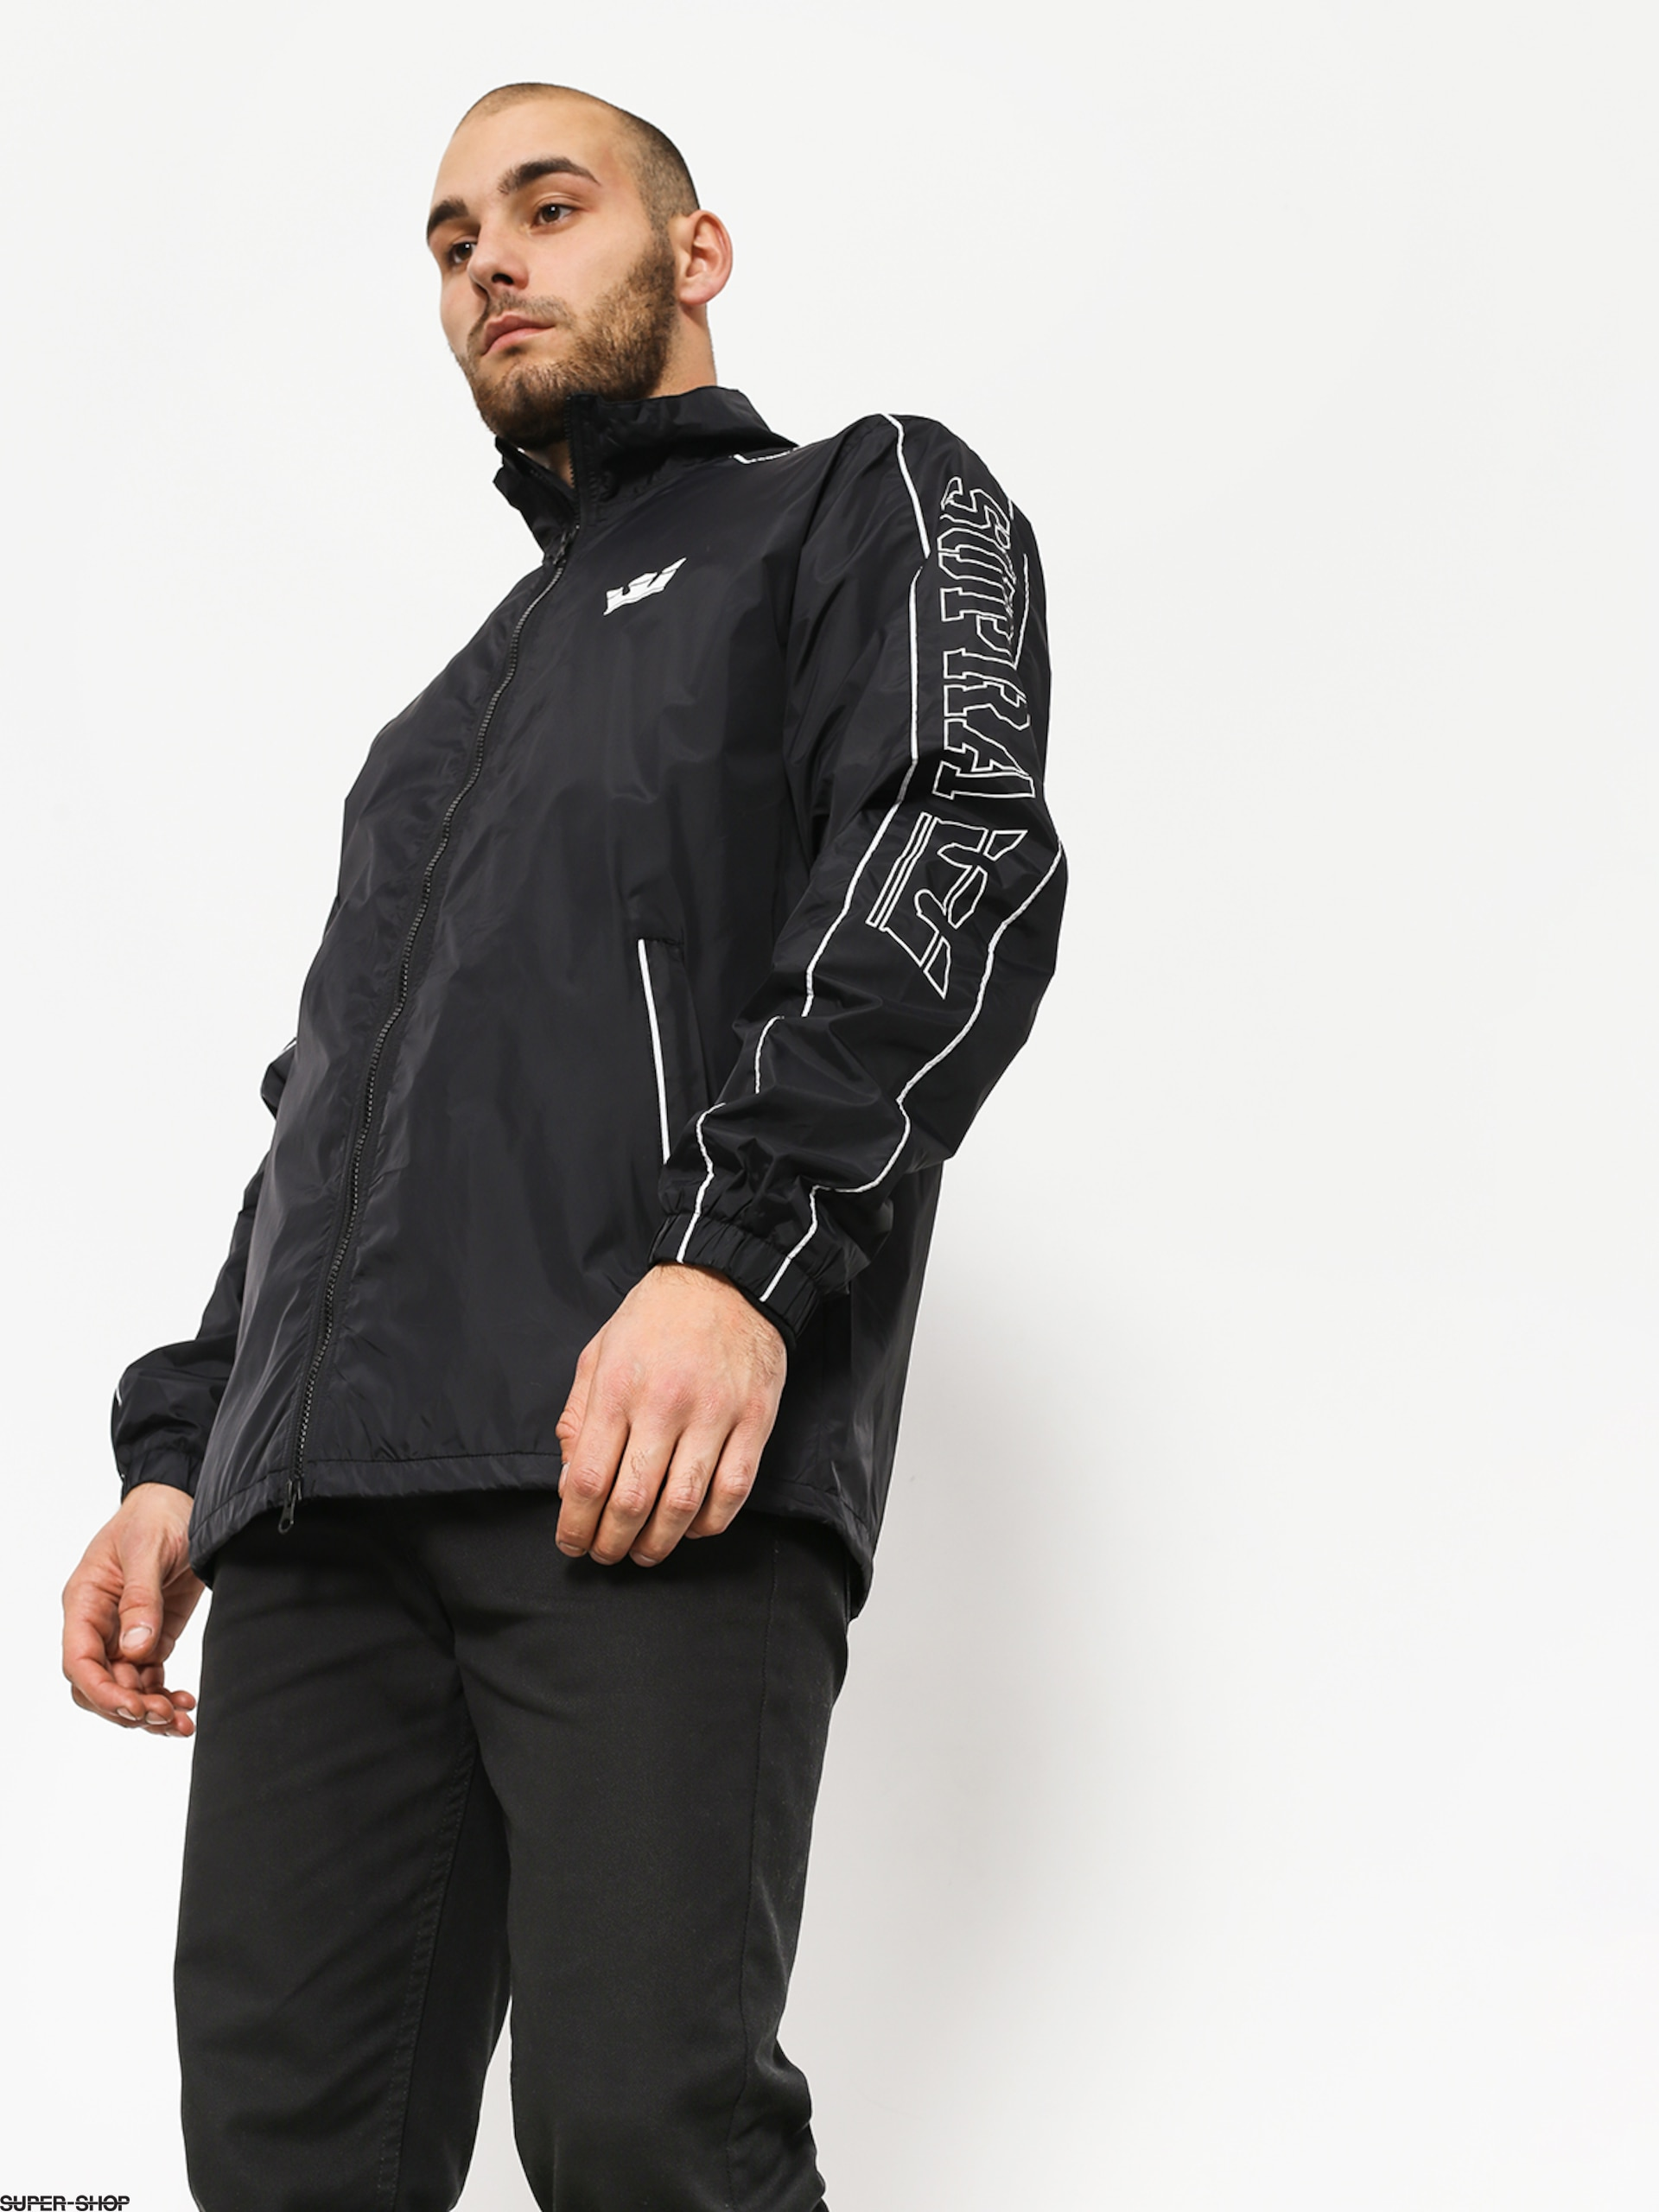 982425-w1920-supra-jacket-wired-black.jpg